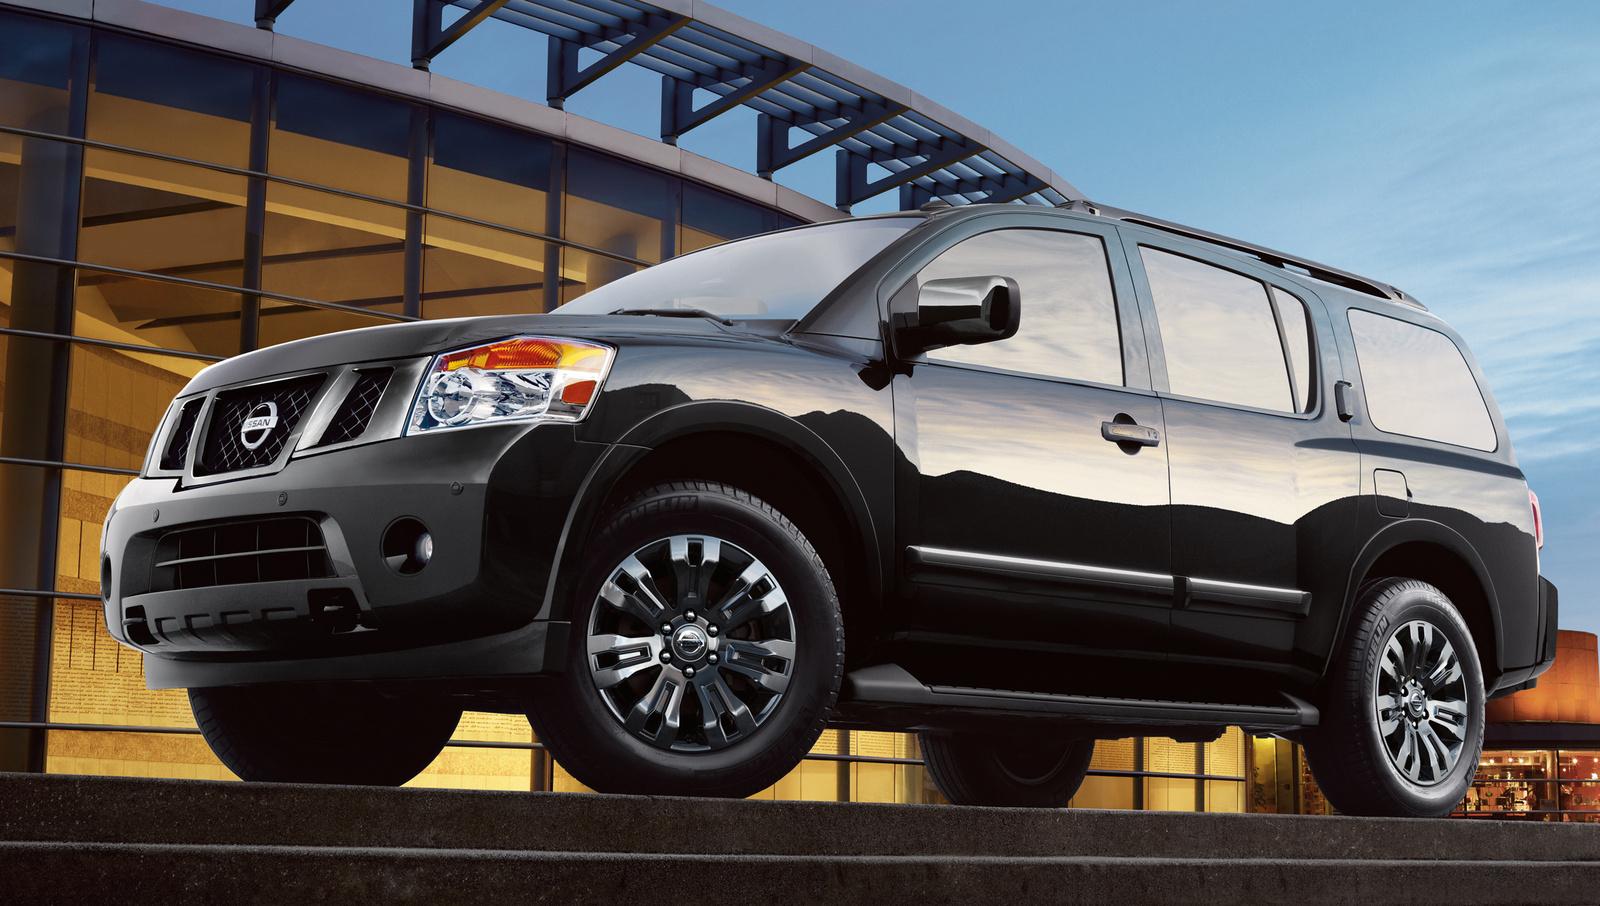 Nissans For Sale >> 2015 Nissan Armada Overview Cargurus